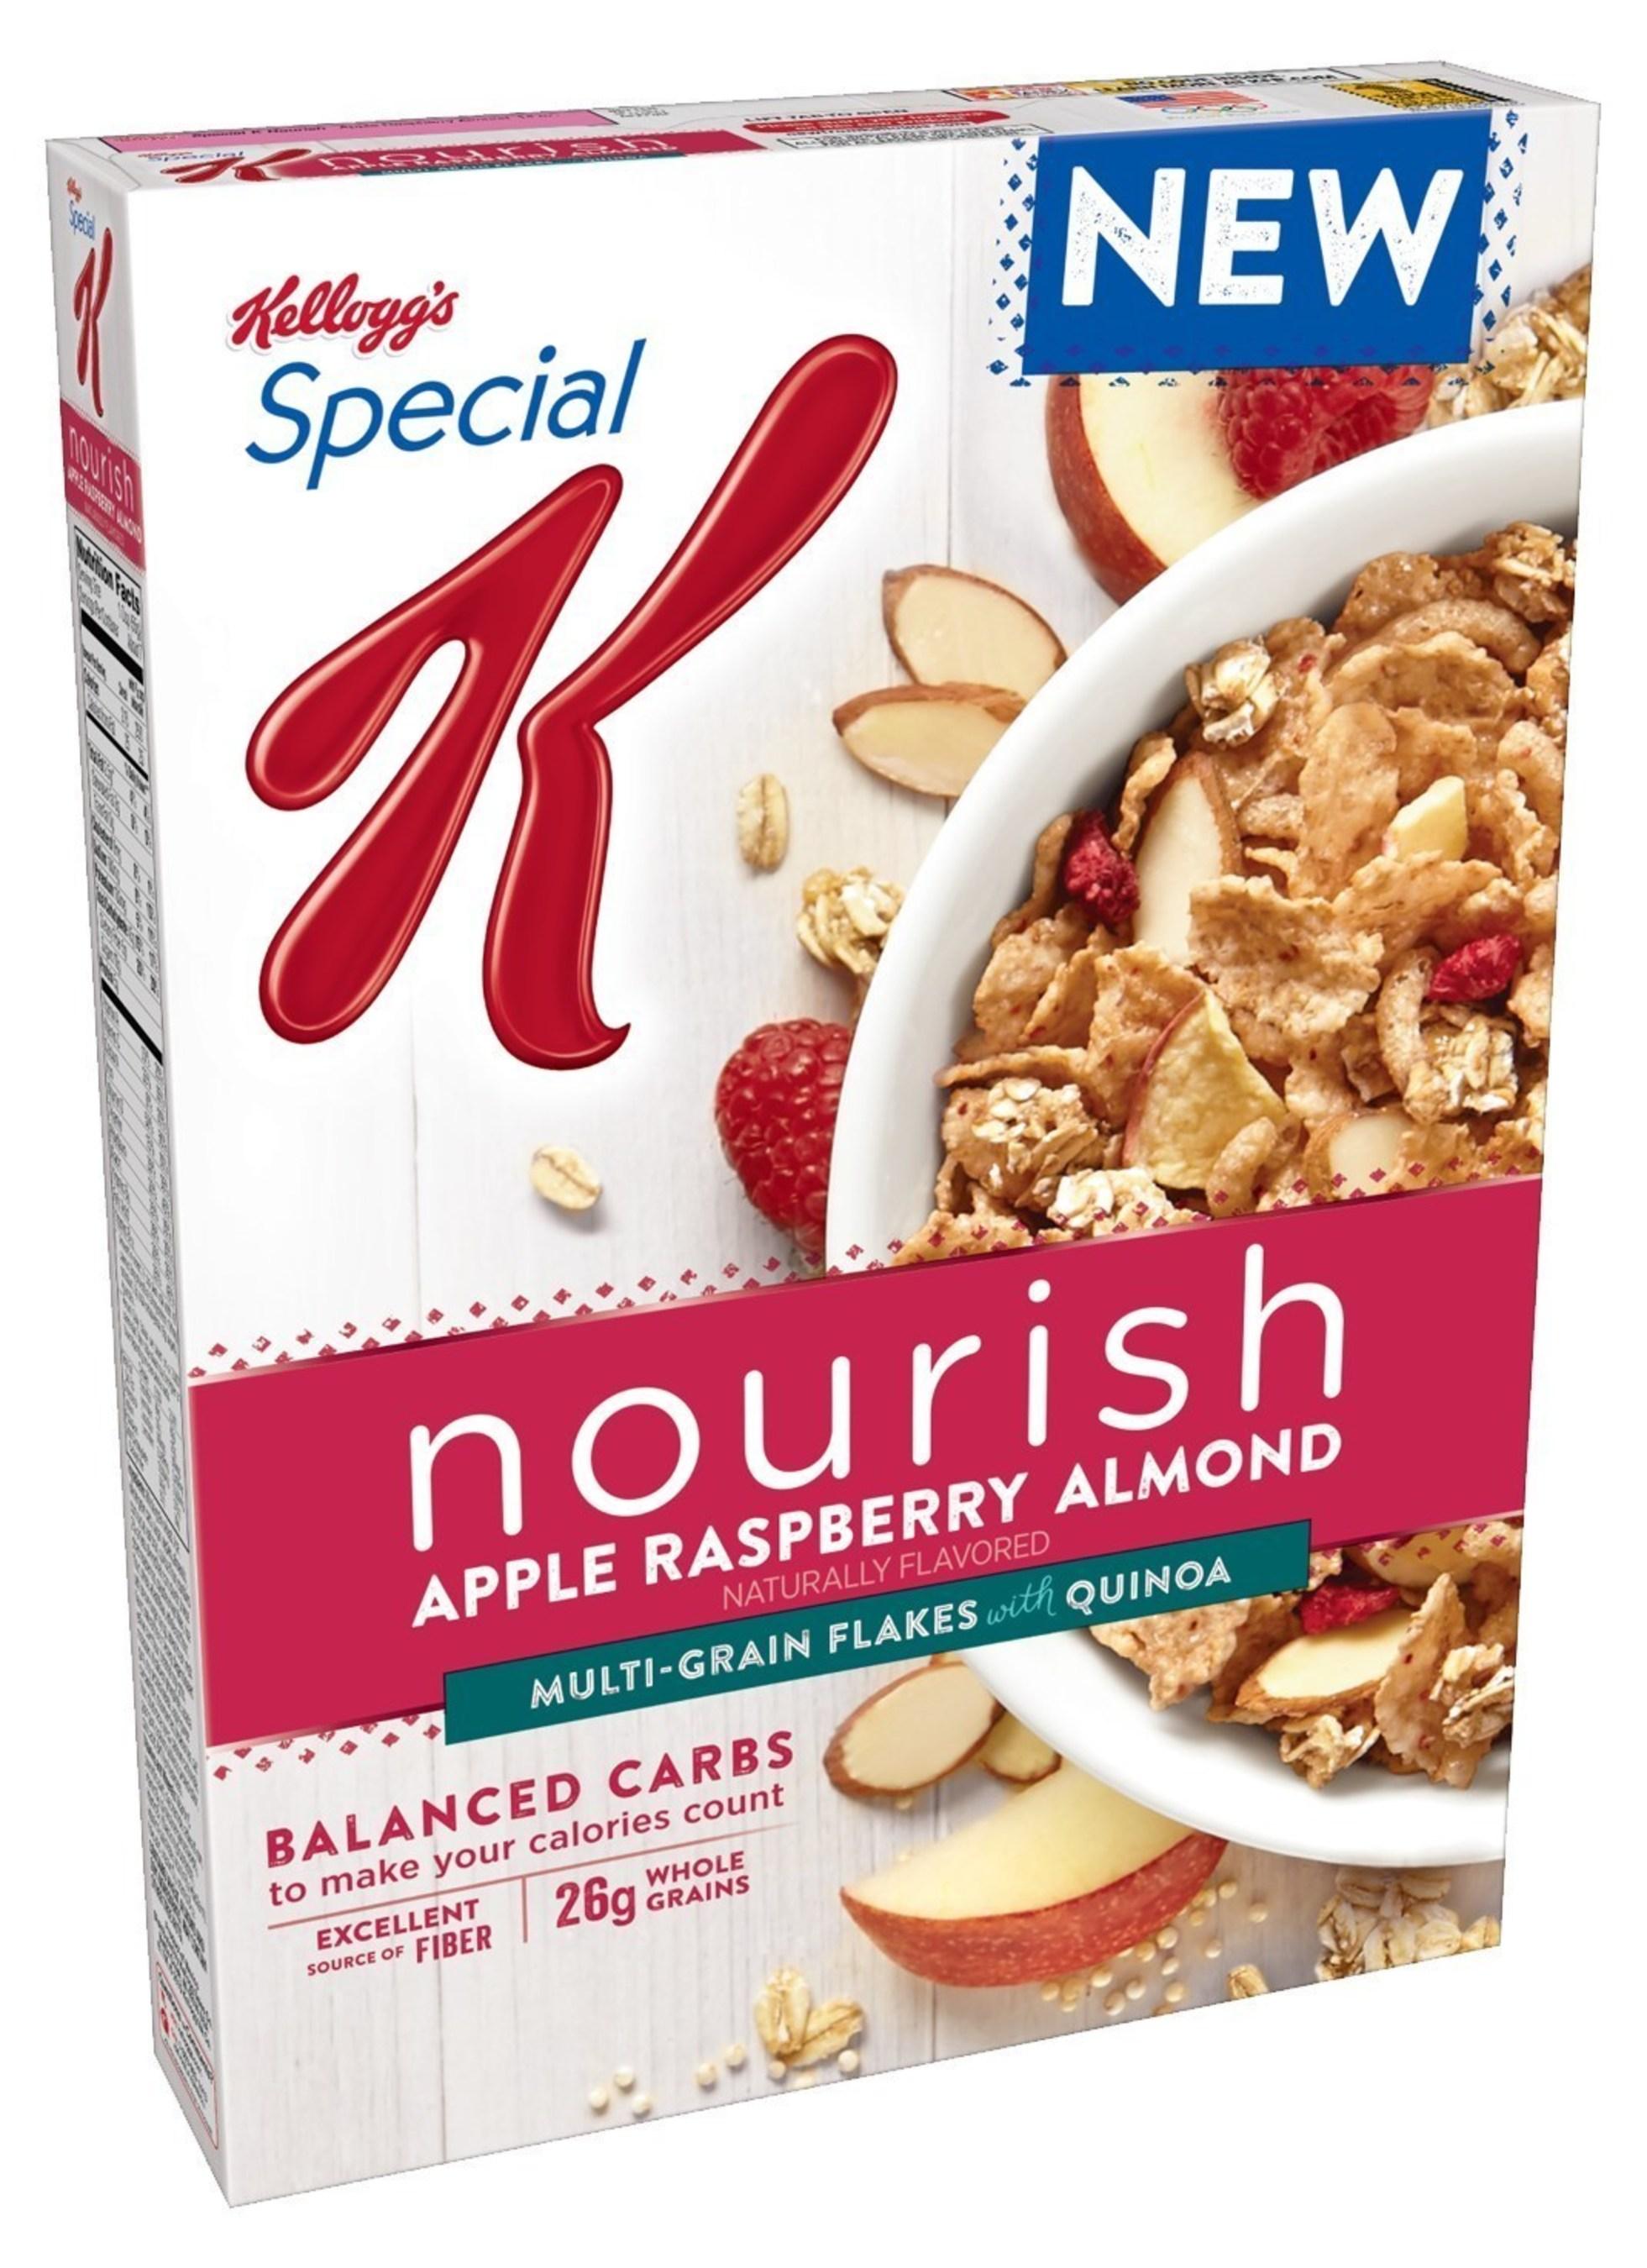 Kellogg's(R) Special K(R) Nourish Apple Raspberry Almond cereal